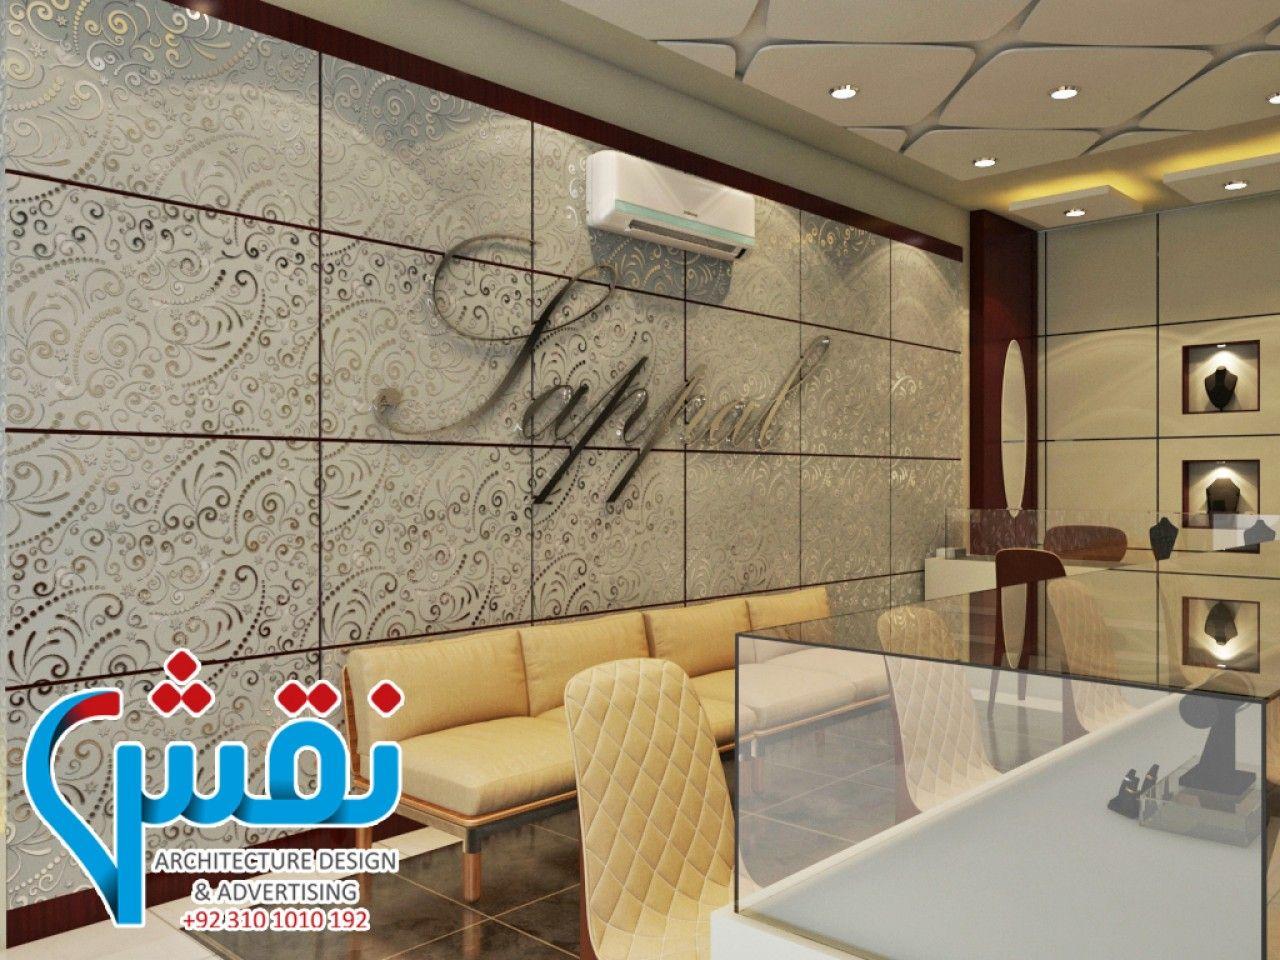 Naqsh Architect Interior Design